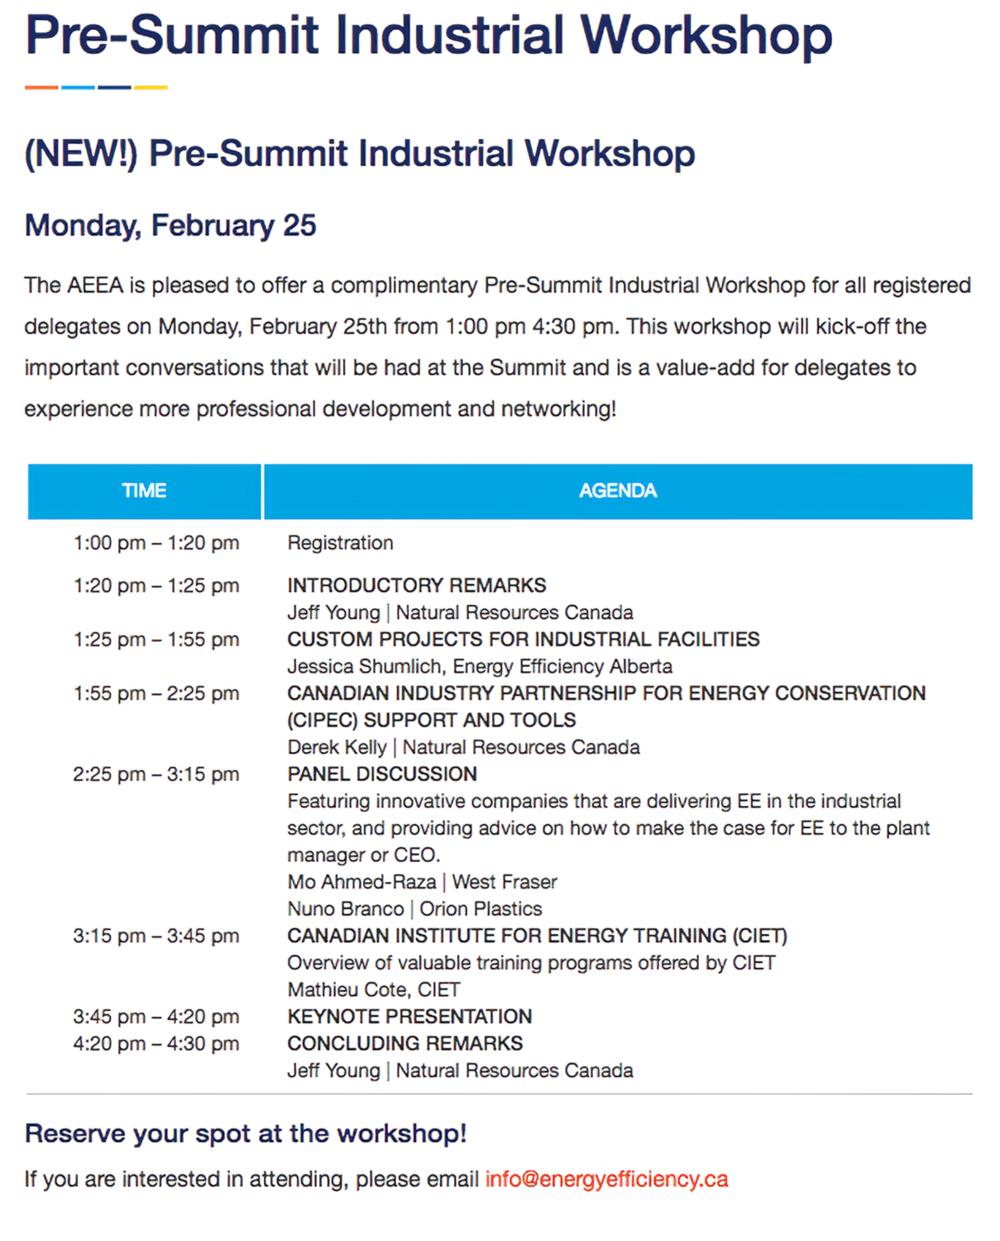 Pre-Summit Workshop Details_1500px.png